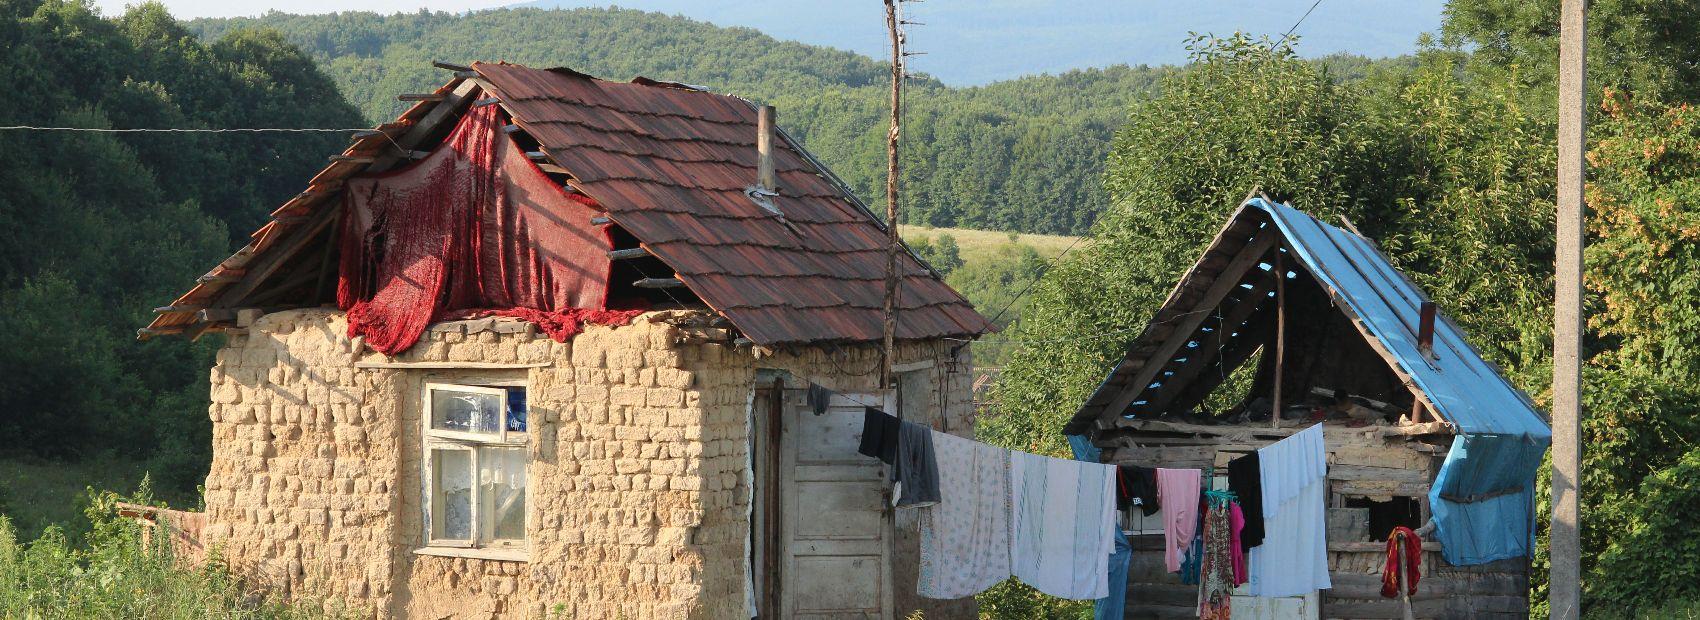 Gypsy Villages